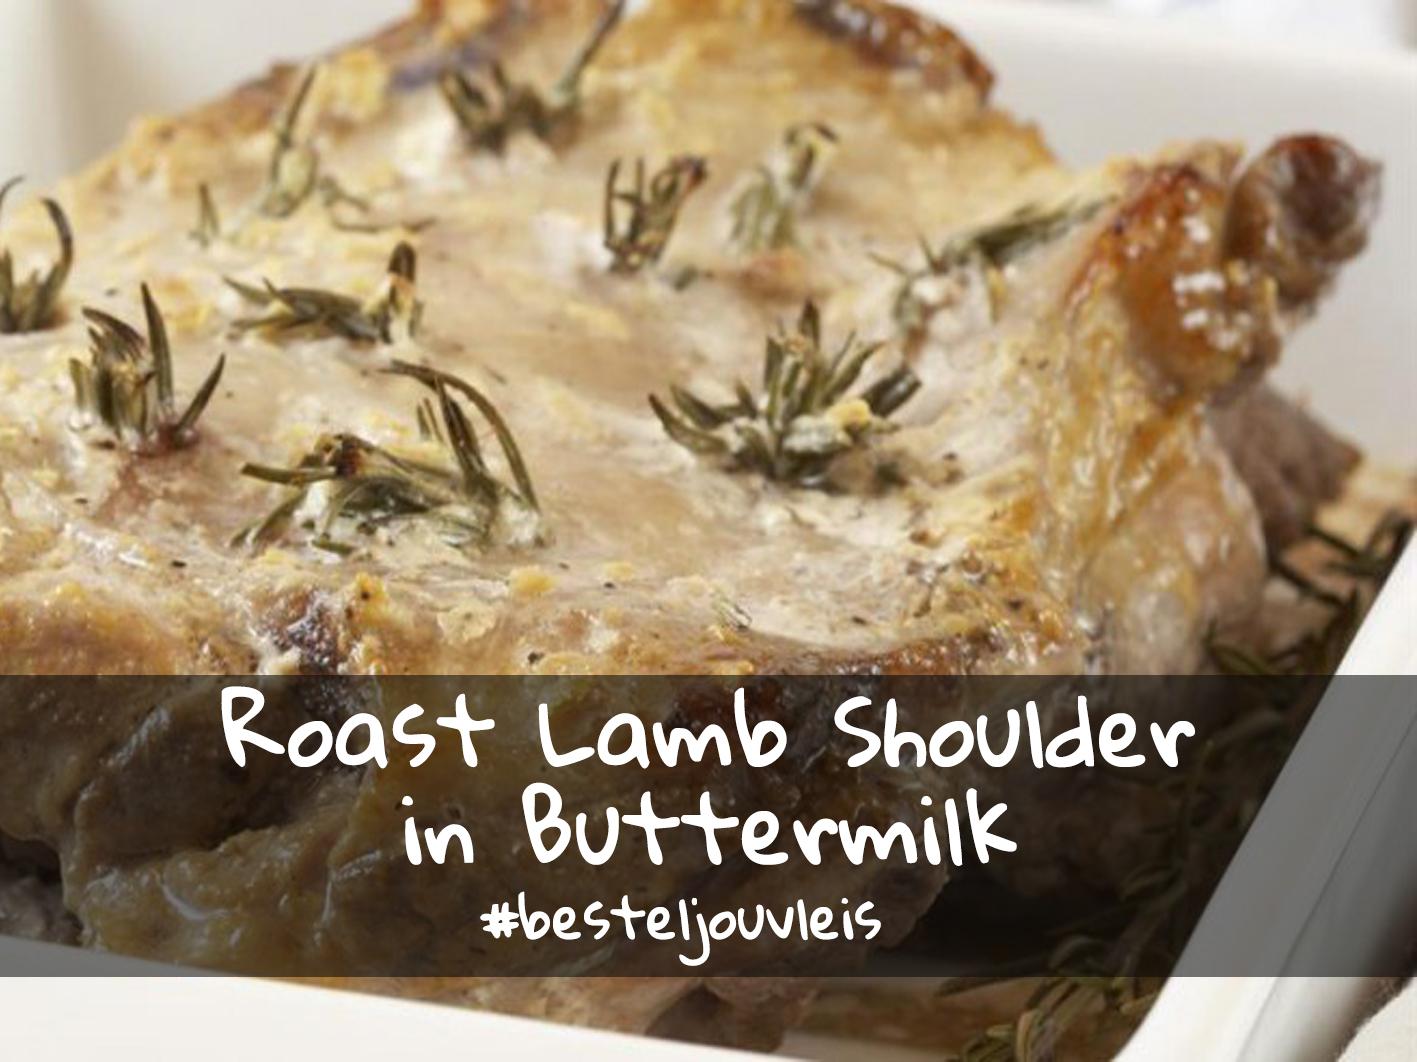 buttermilk lamb.jpg